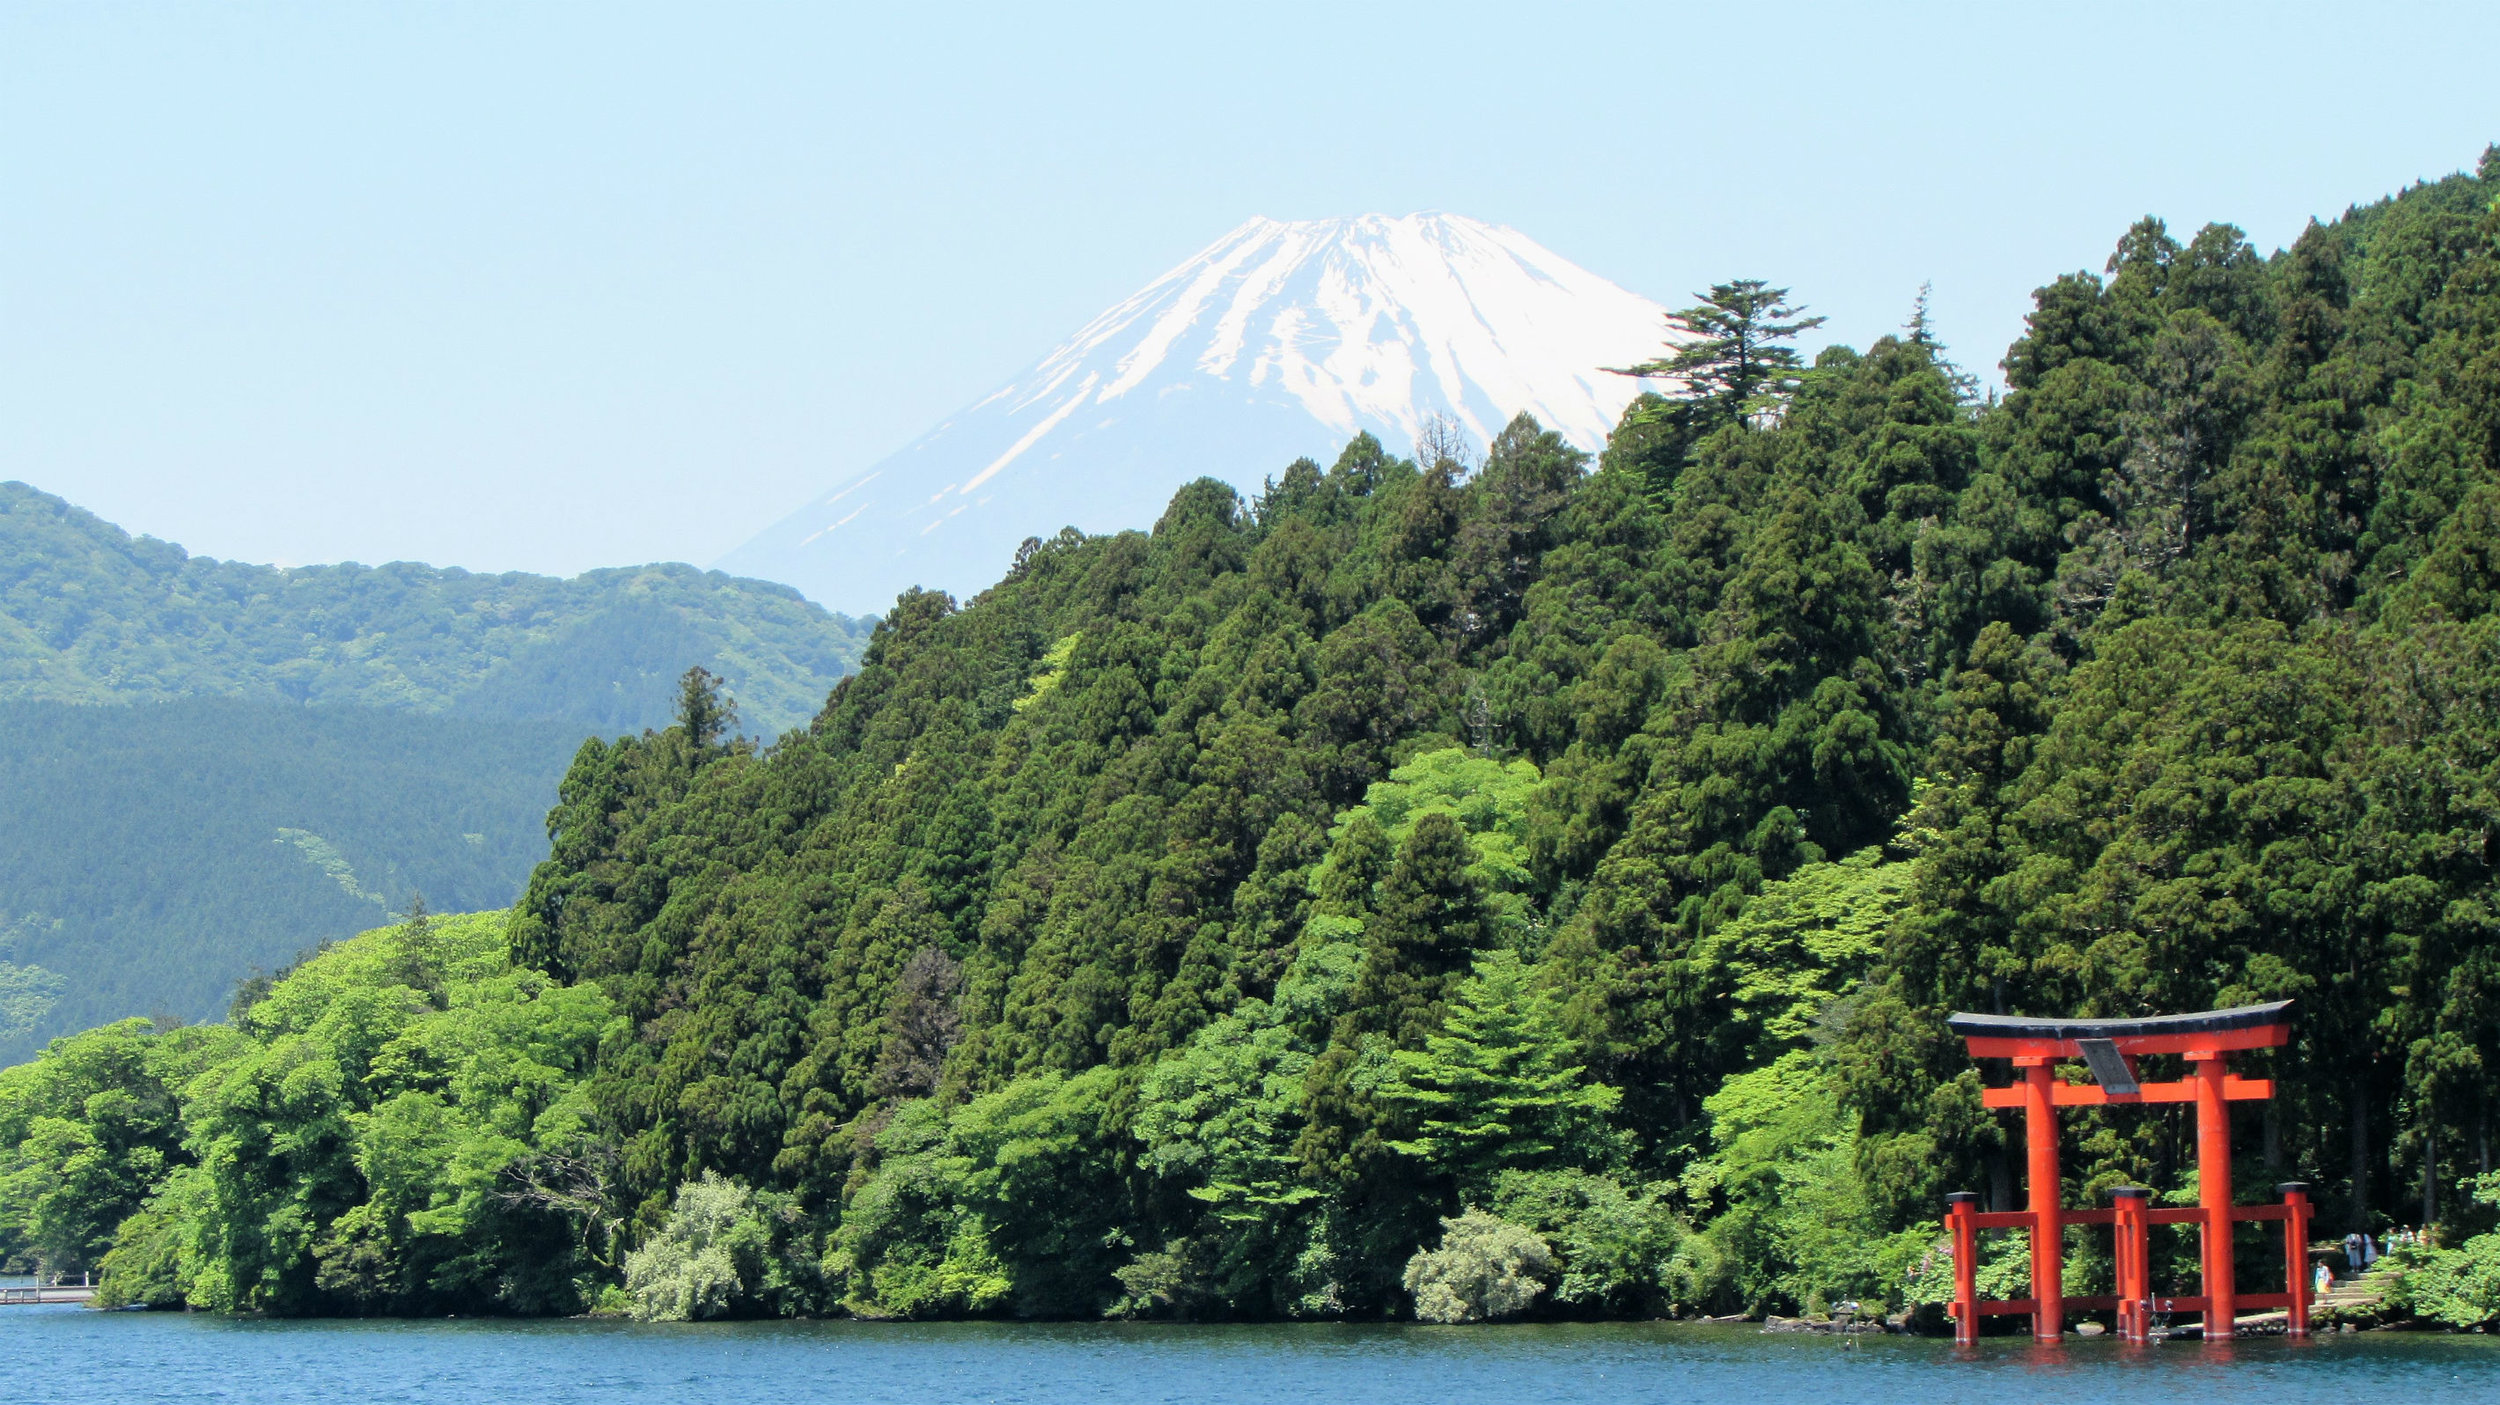 Lake Ashi with view of Mt. Fuji